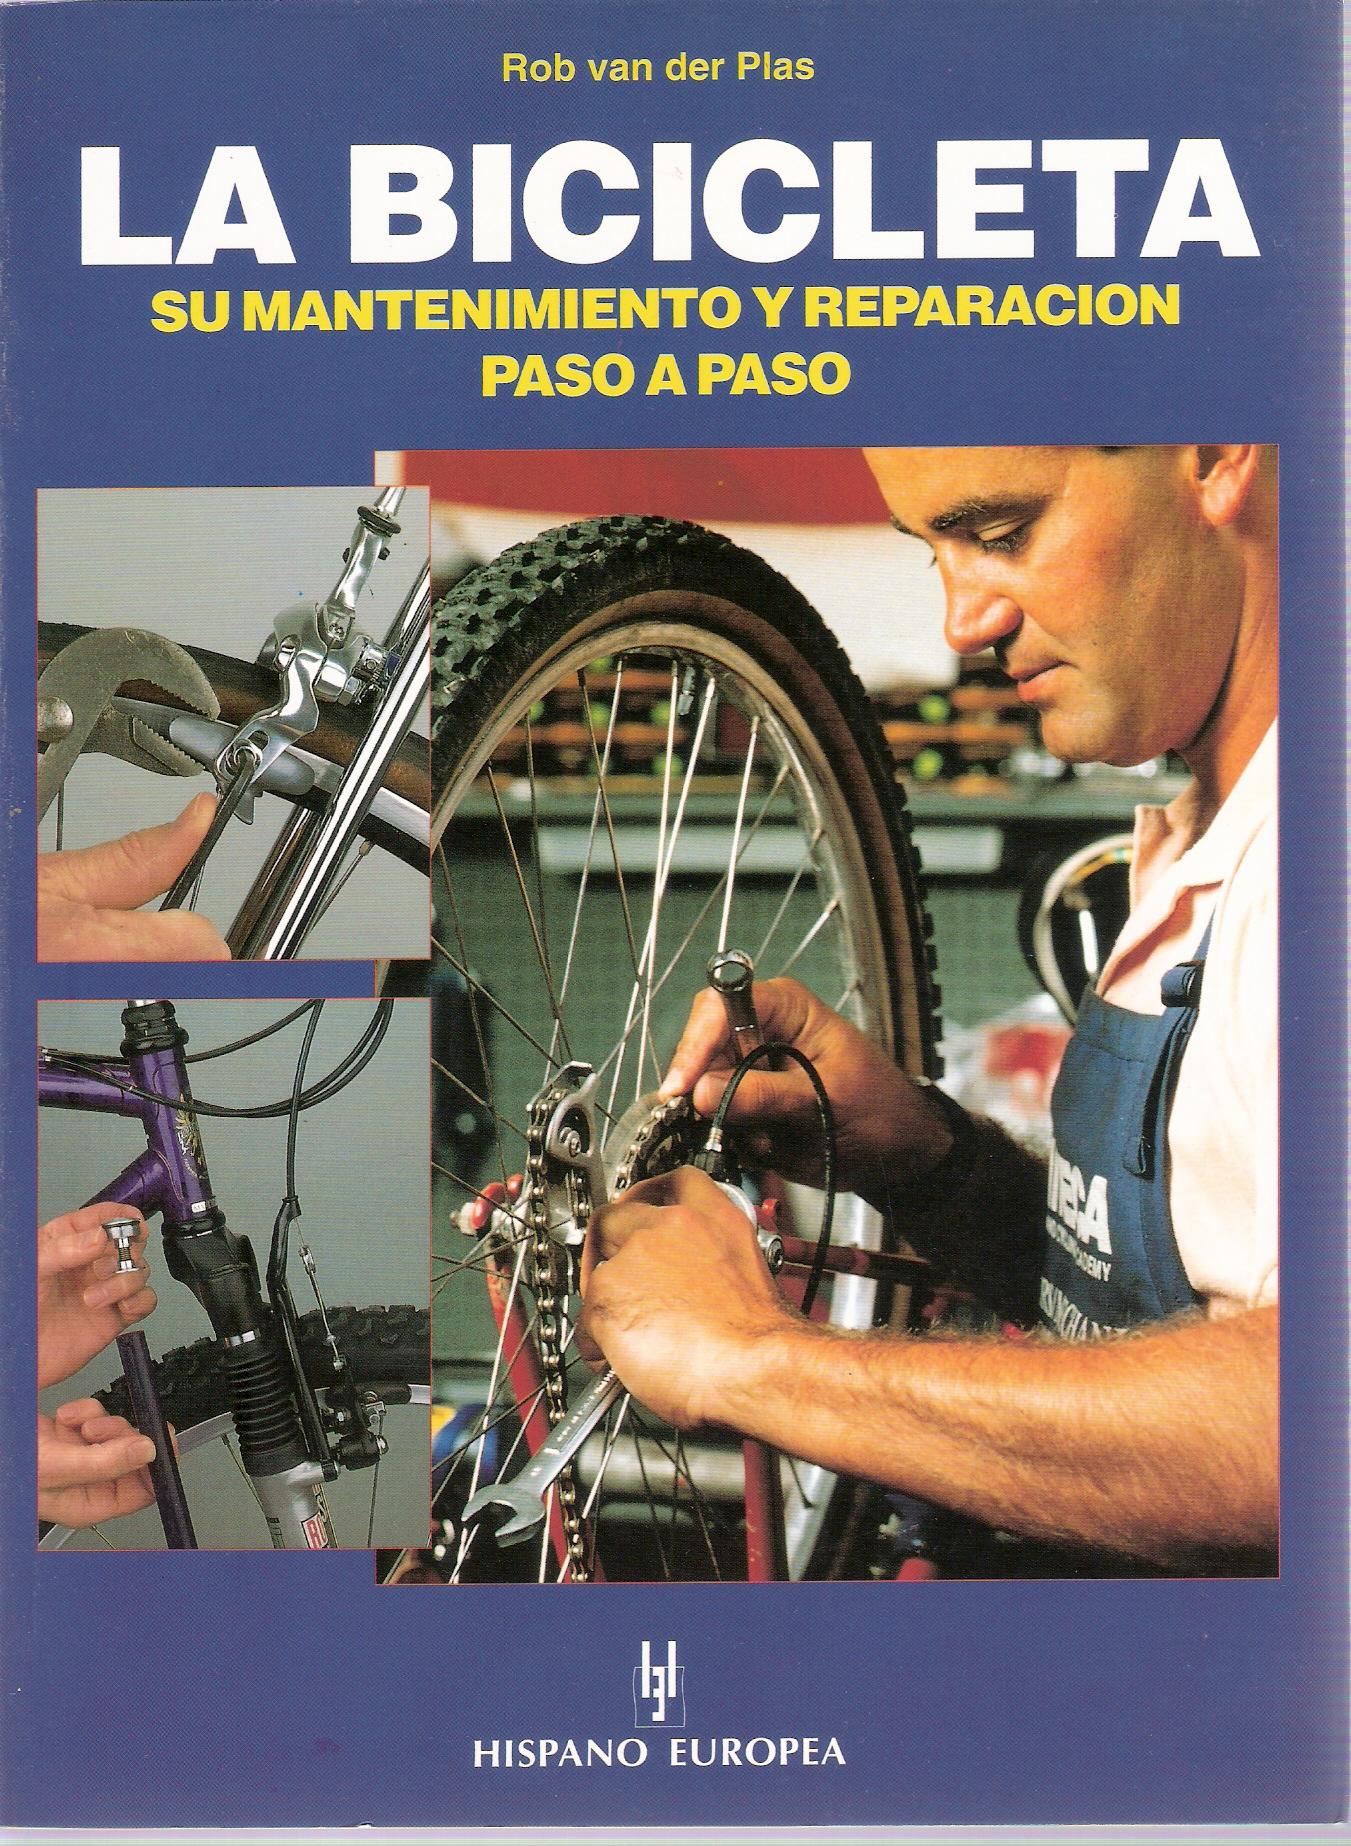 La Bicicleta / Cycle Repair Step by Step